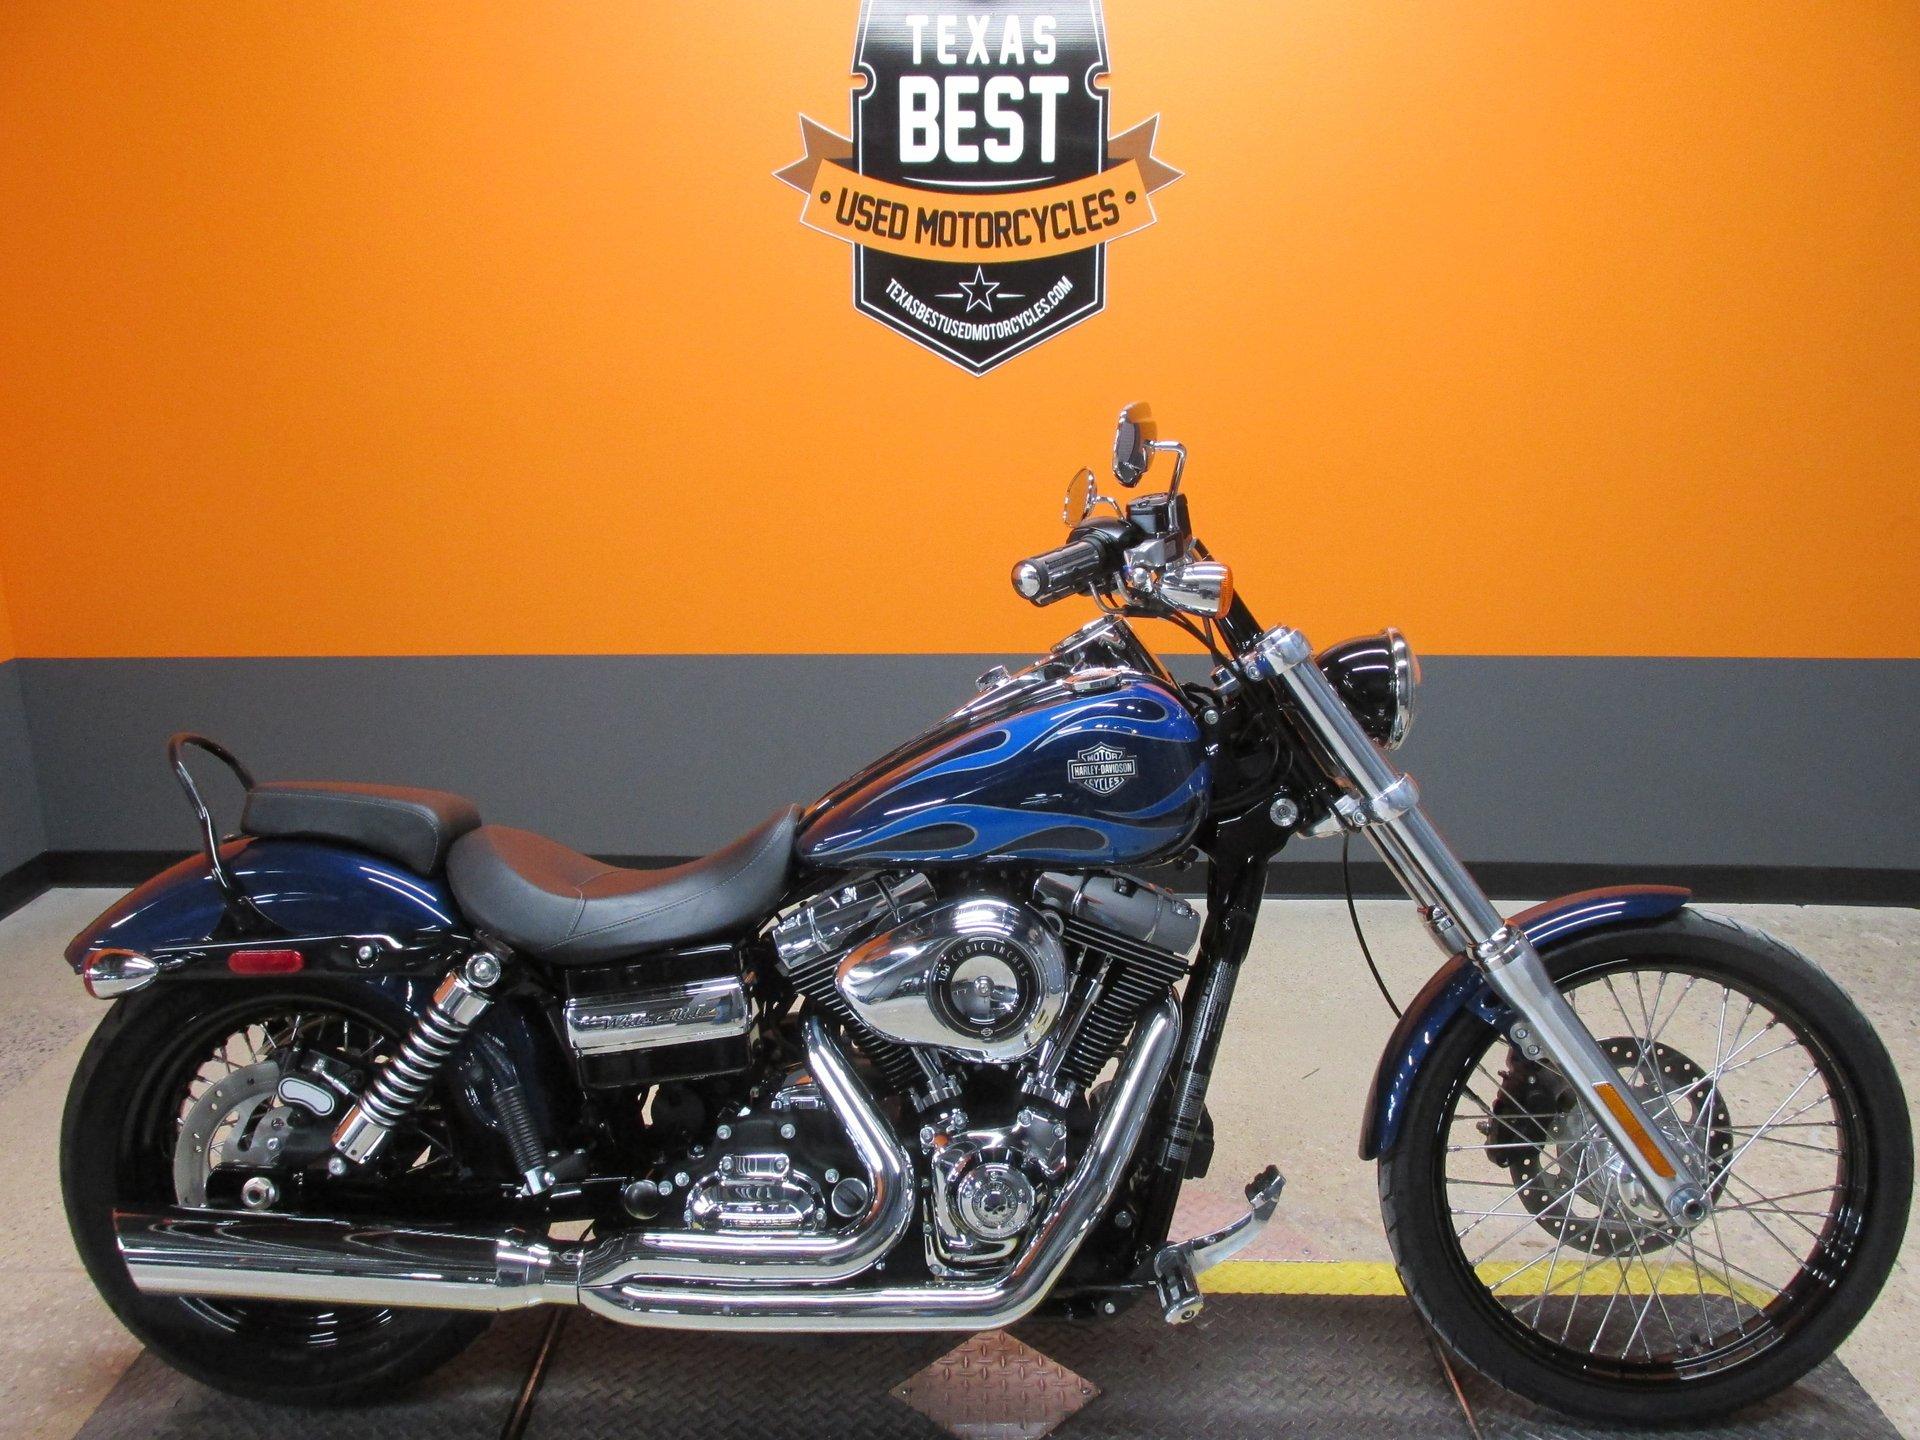 2012 Harley Davidson Dyna Wide Glide American Motorcycle Trading Company Used Harley Davidson Motorcycles